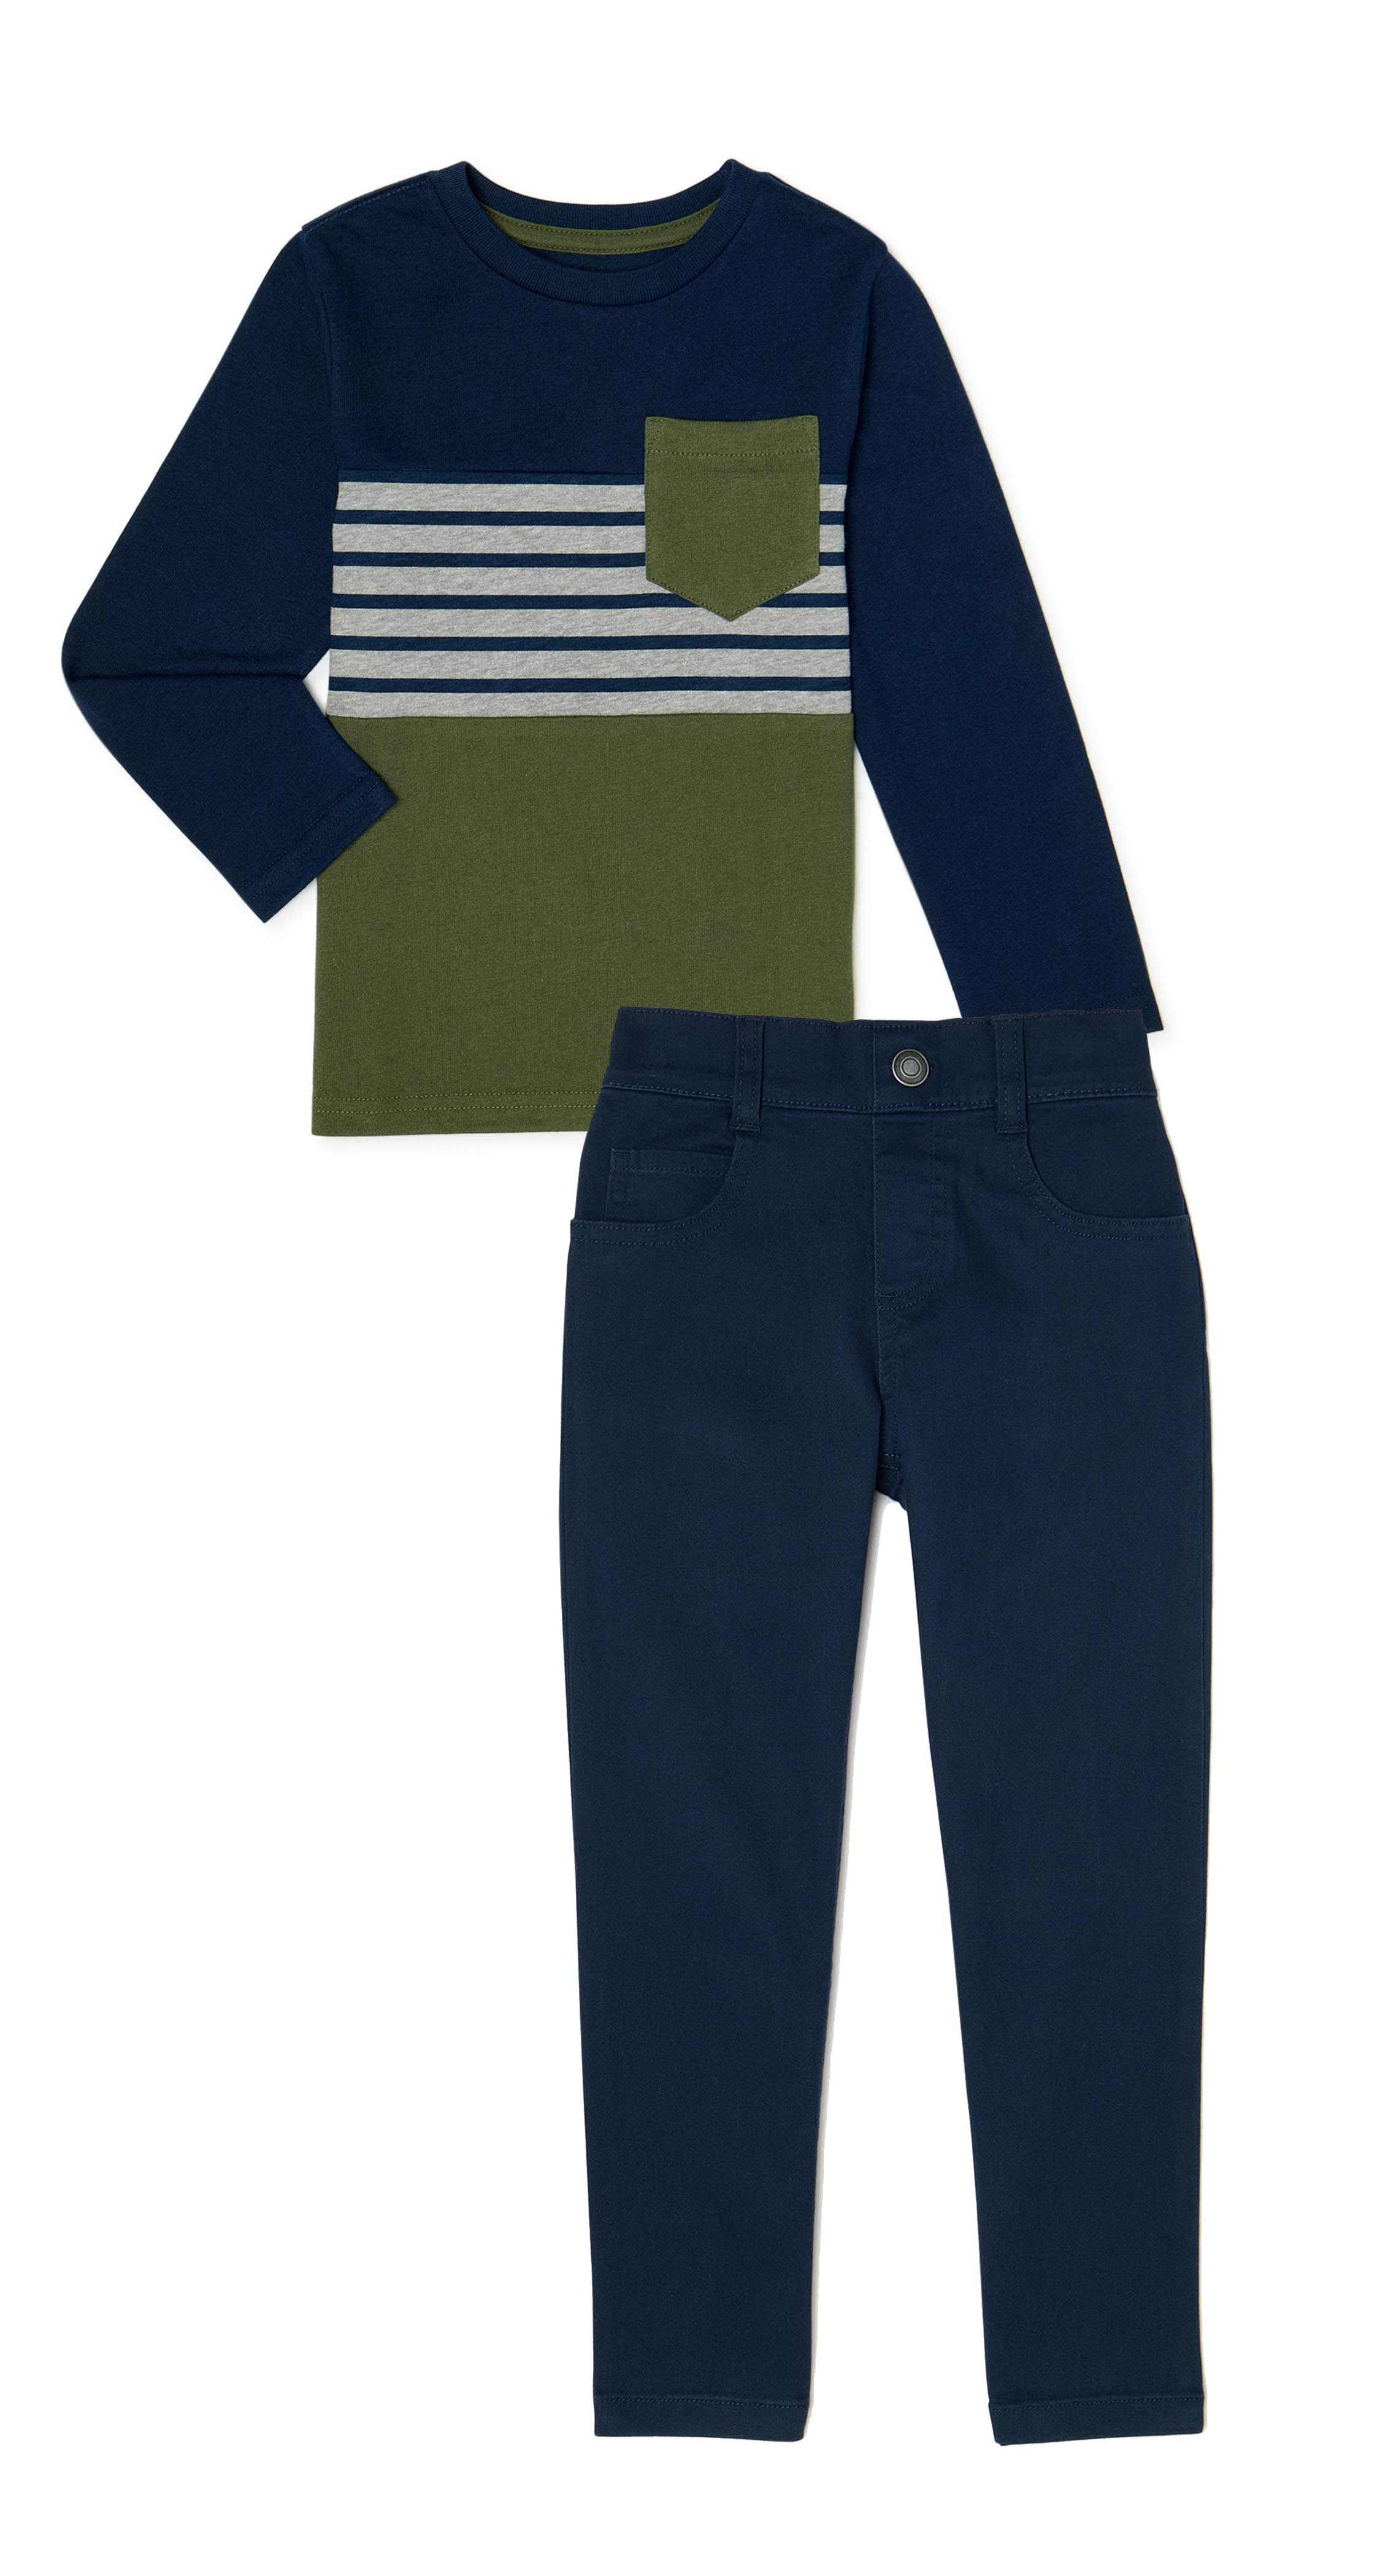 and Jogger Pant Pants Set English Laundry Baby-Boys Long Sleeve T-Shirt Henley T-Shirt